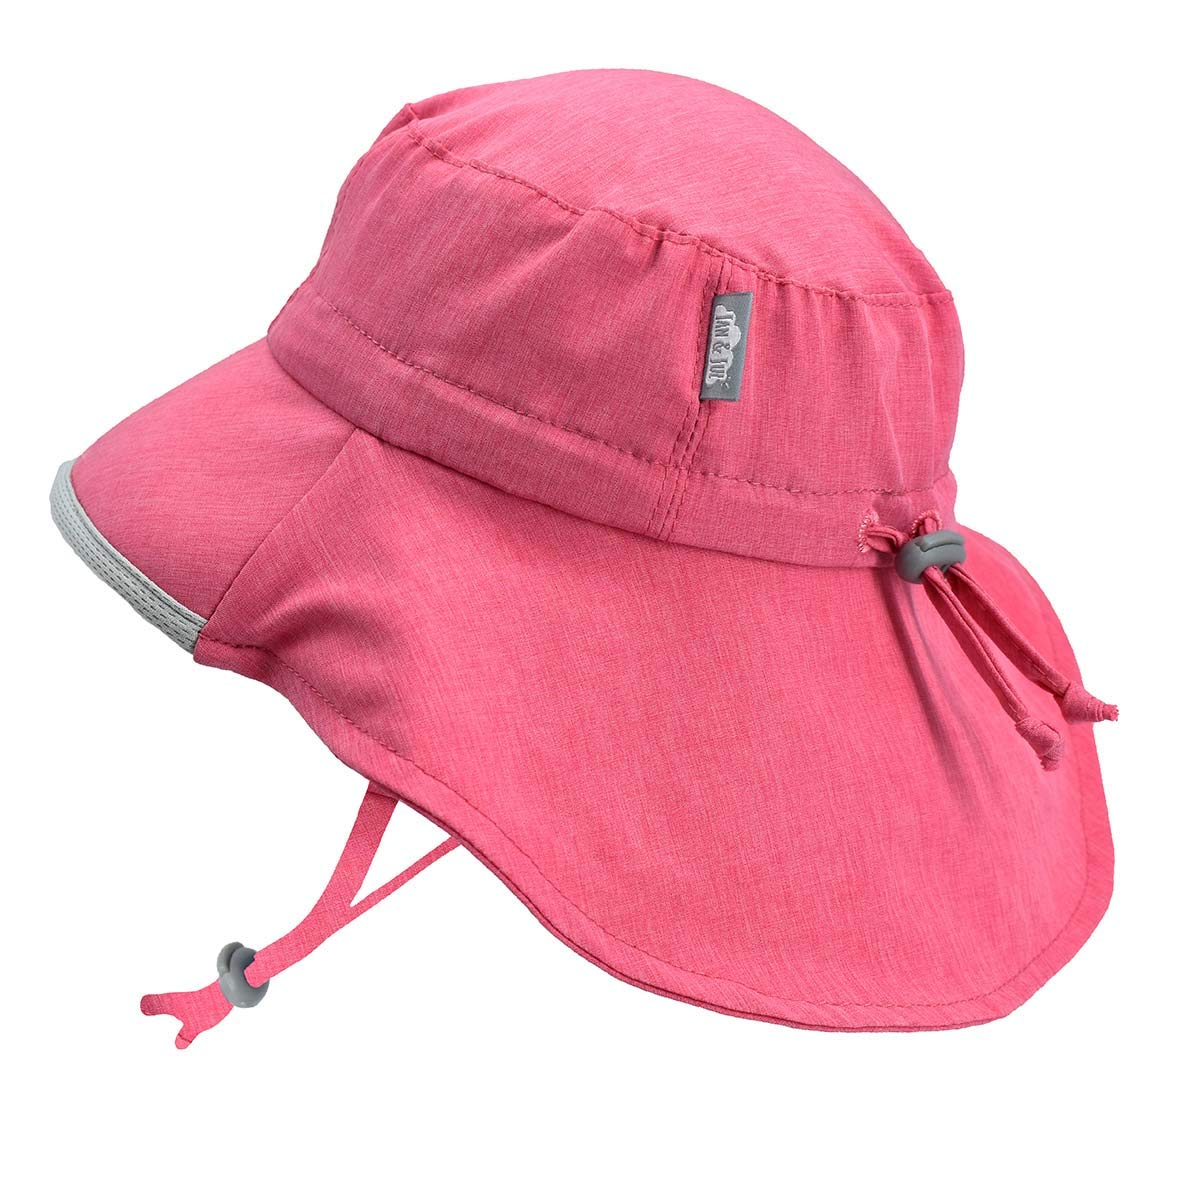 Girls Quick-Dry Pool Swim Sun-Hats 50+ UPF Adjustable (L: 2Y - 5Y, Pink)